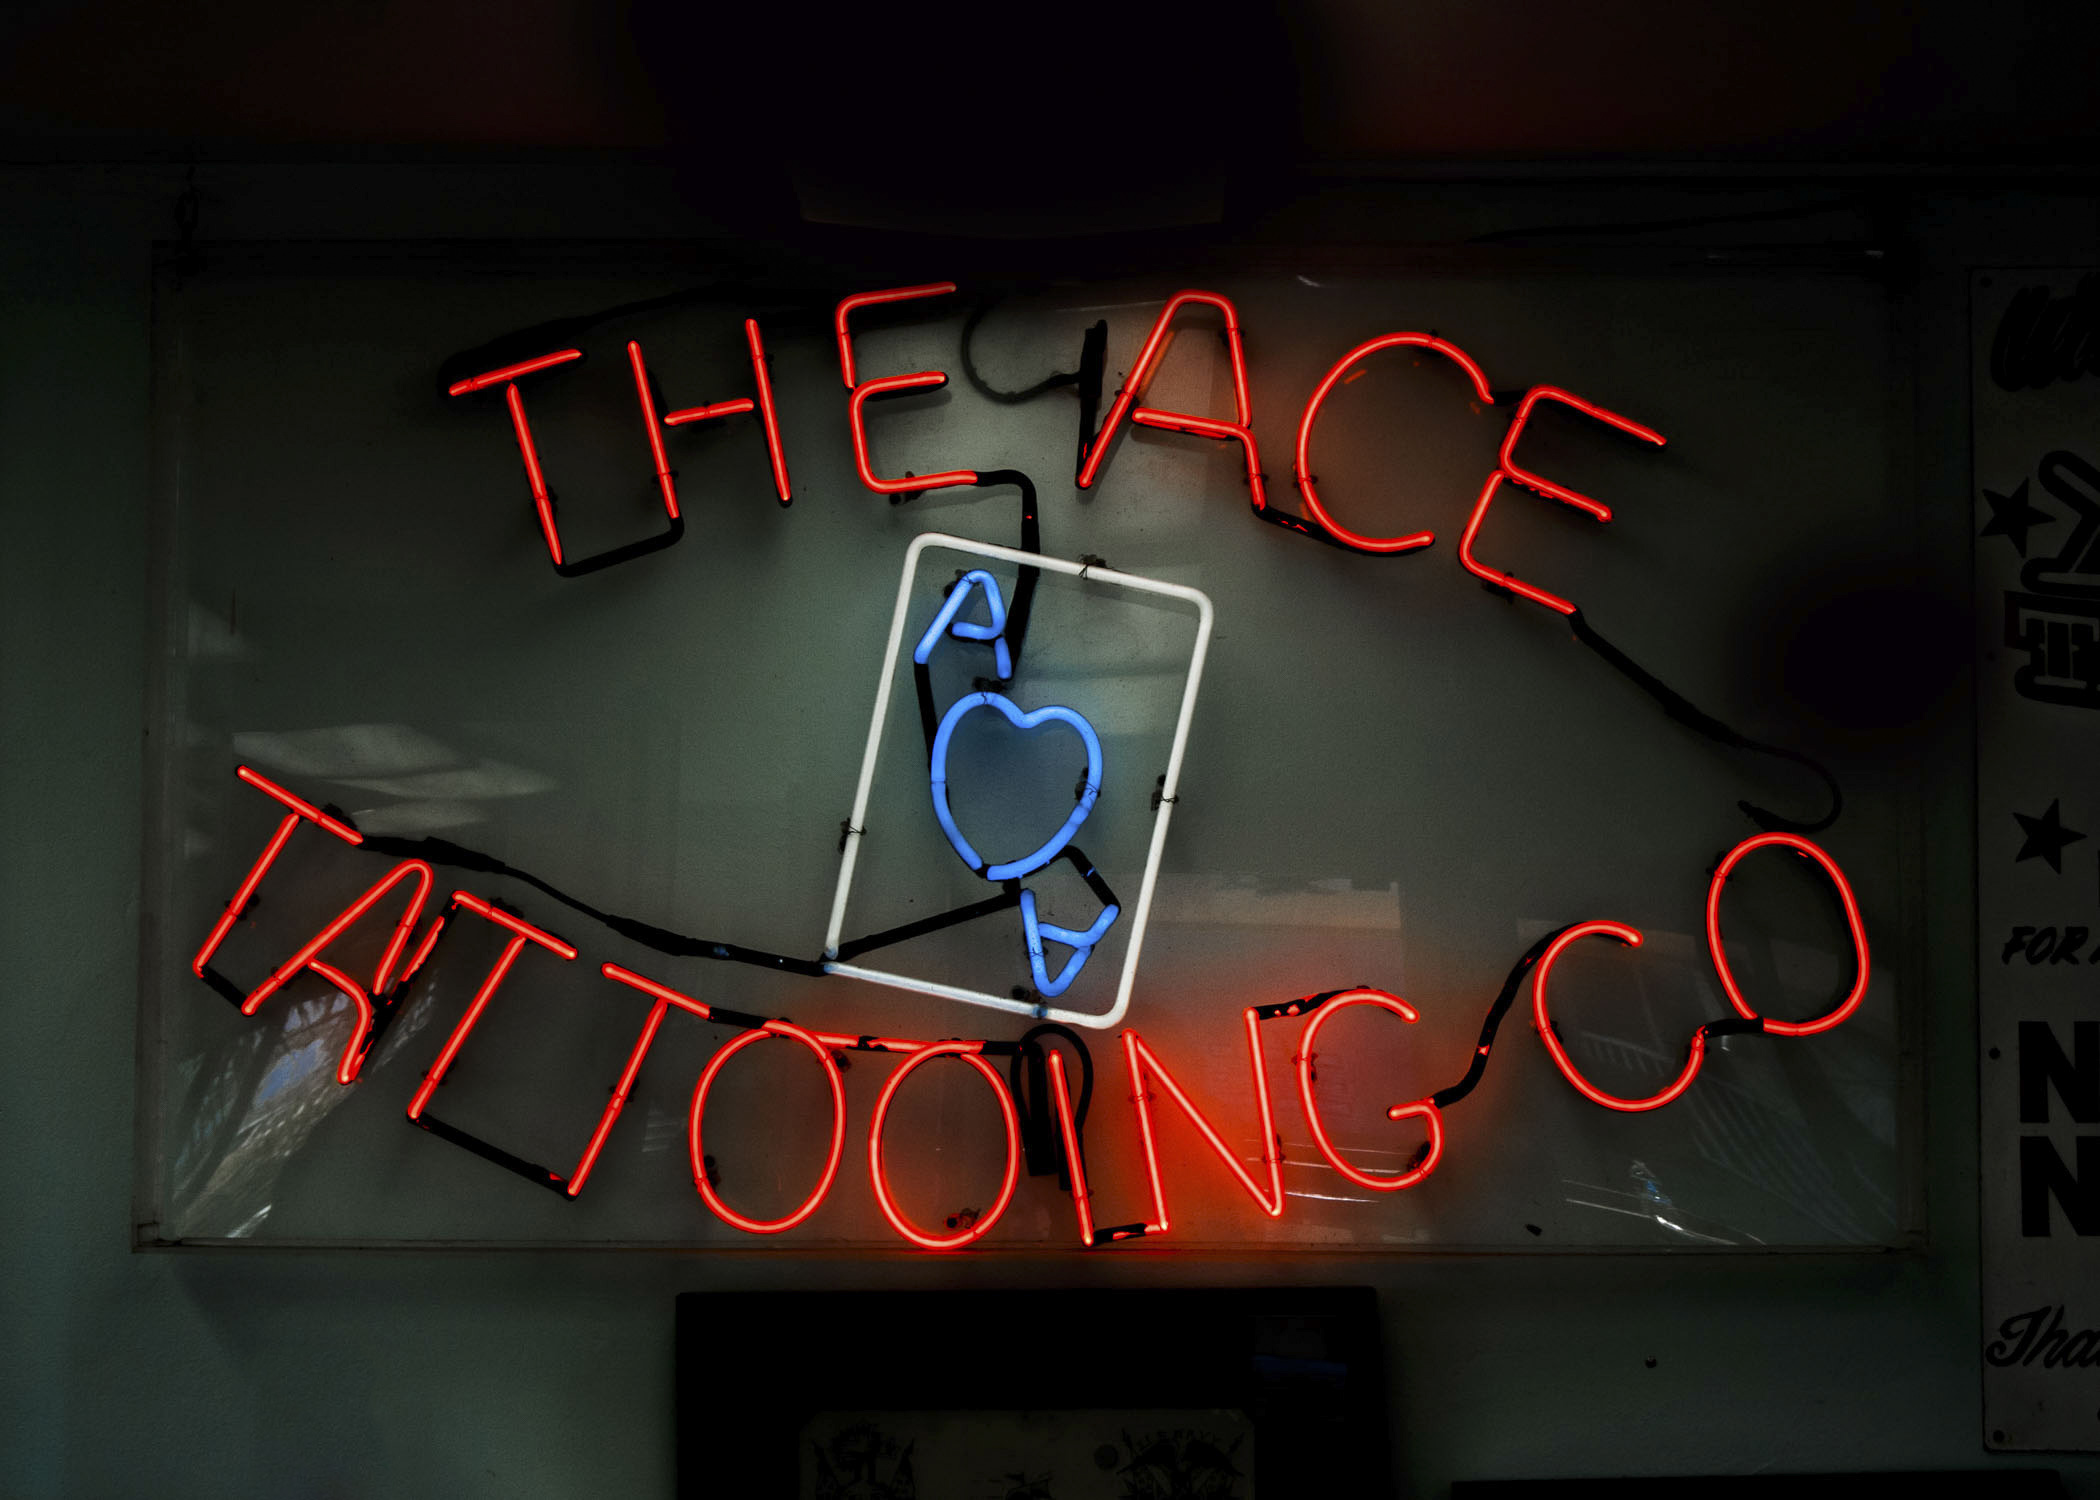 ace_000b.jpg